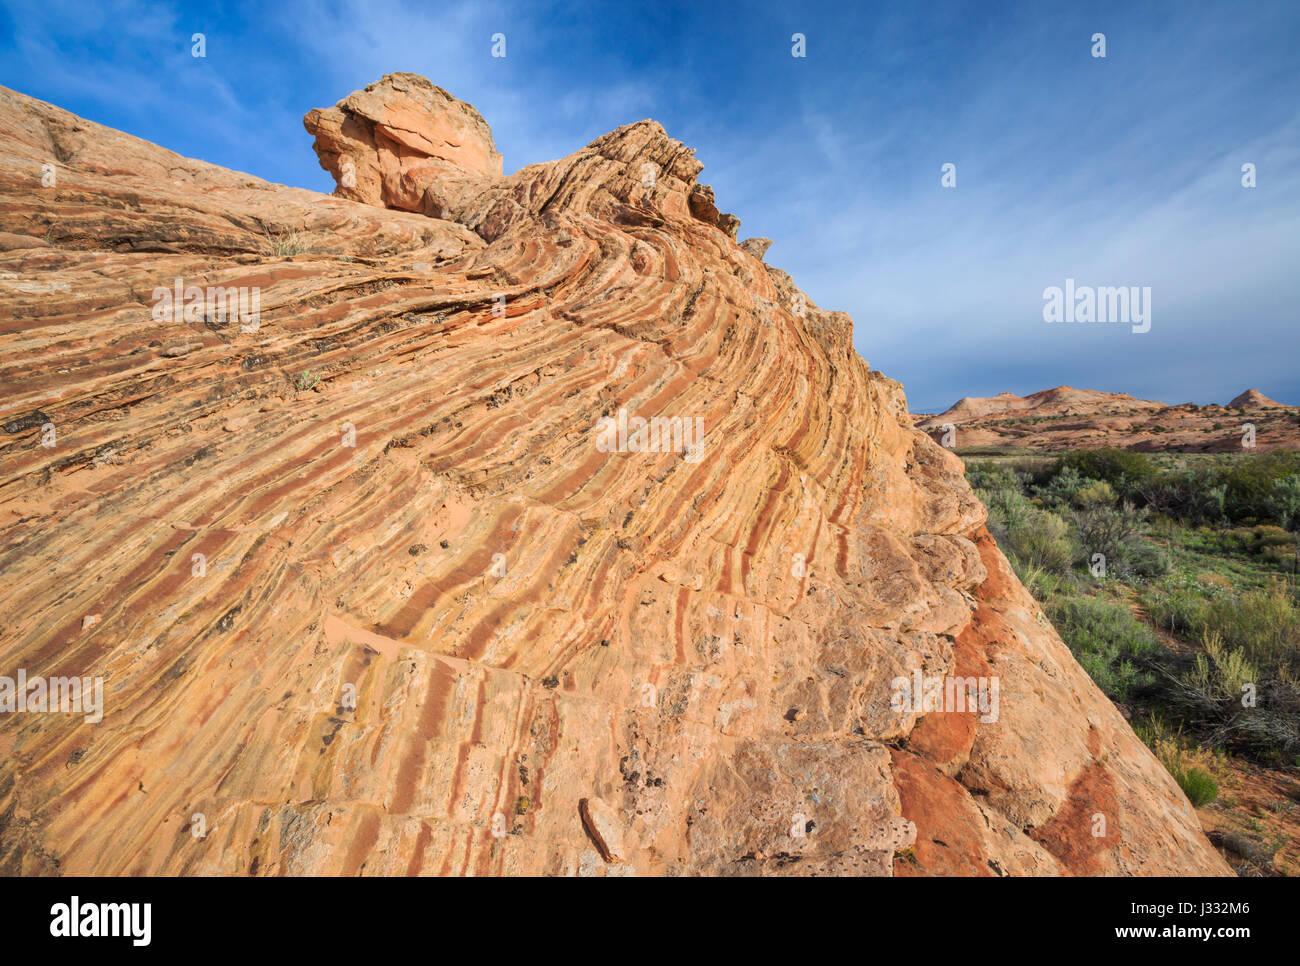 striped sandstone slickrock in the harris wash basin near escalante, utah - Stock Image